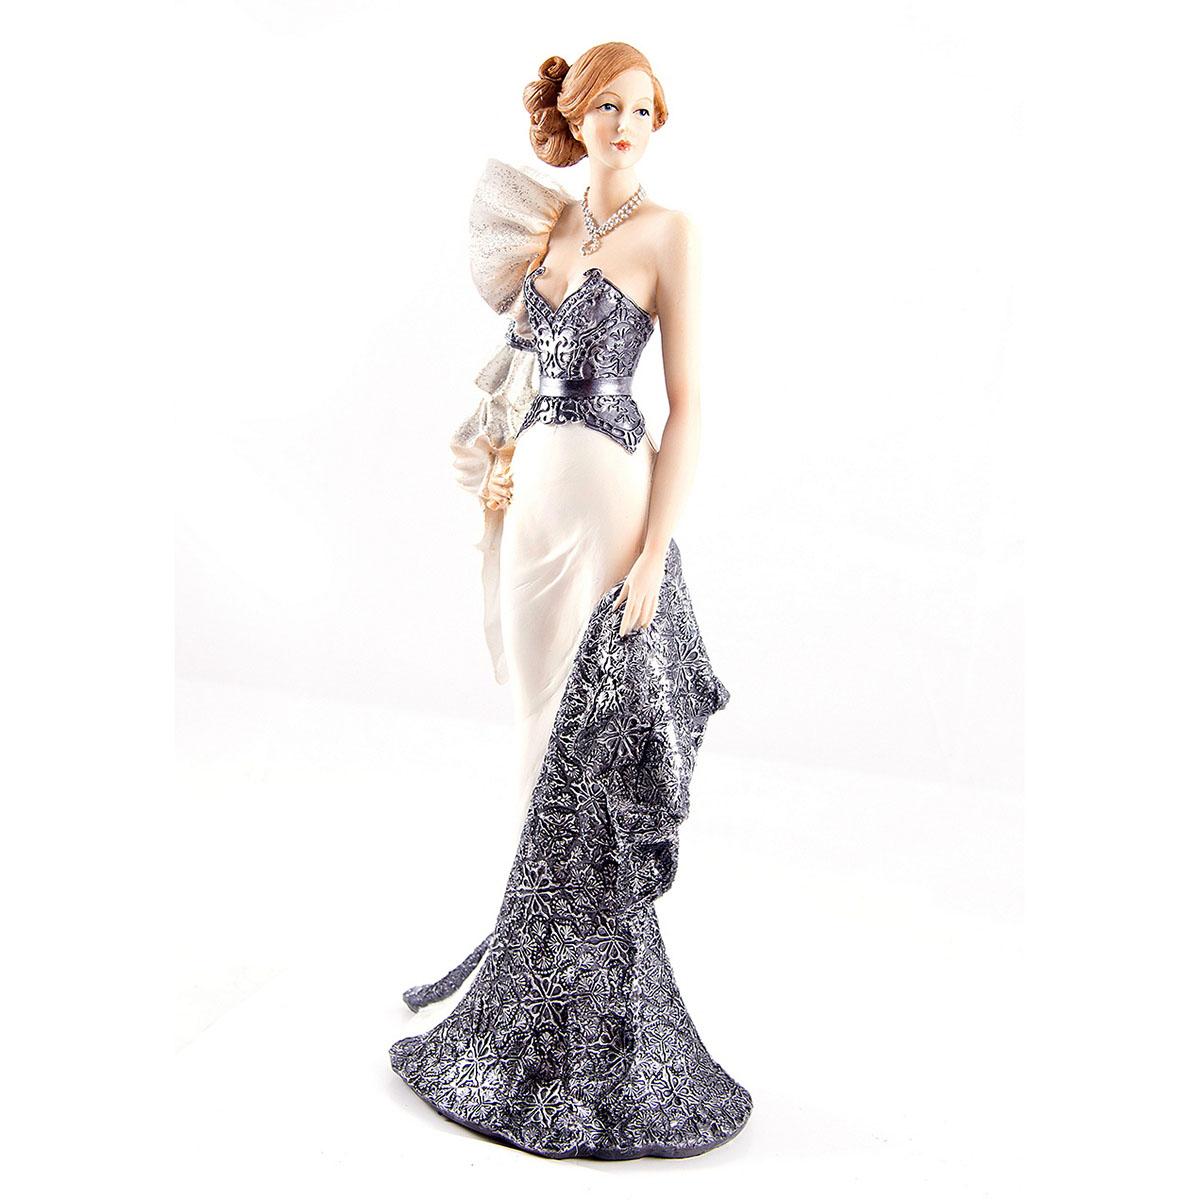 Статуэтка Русские Подарки Мисс Изысканность, 15 х 8 х 34 см статуэтка русские подарки мисс рандеву 11 х 10 х 31 см